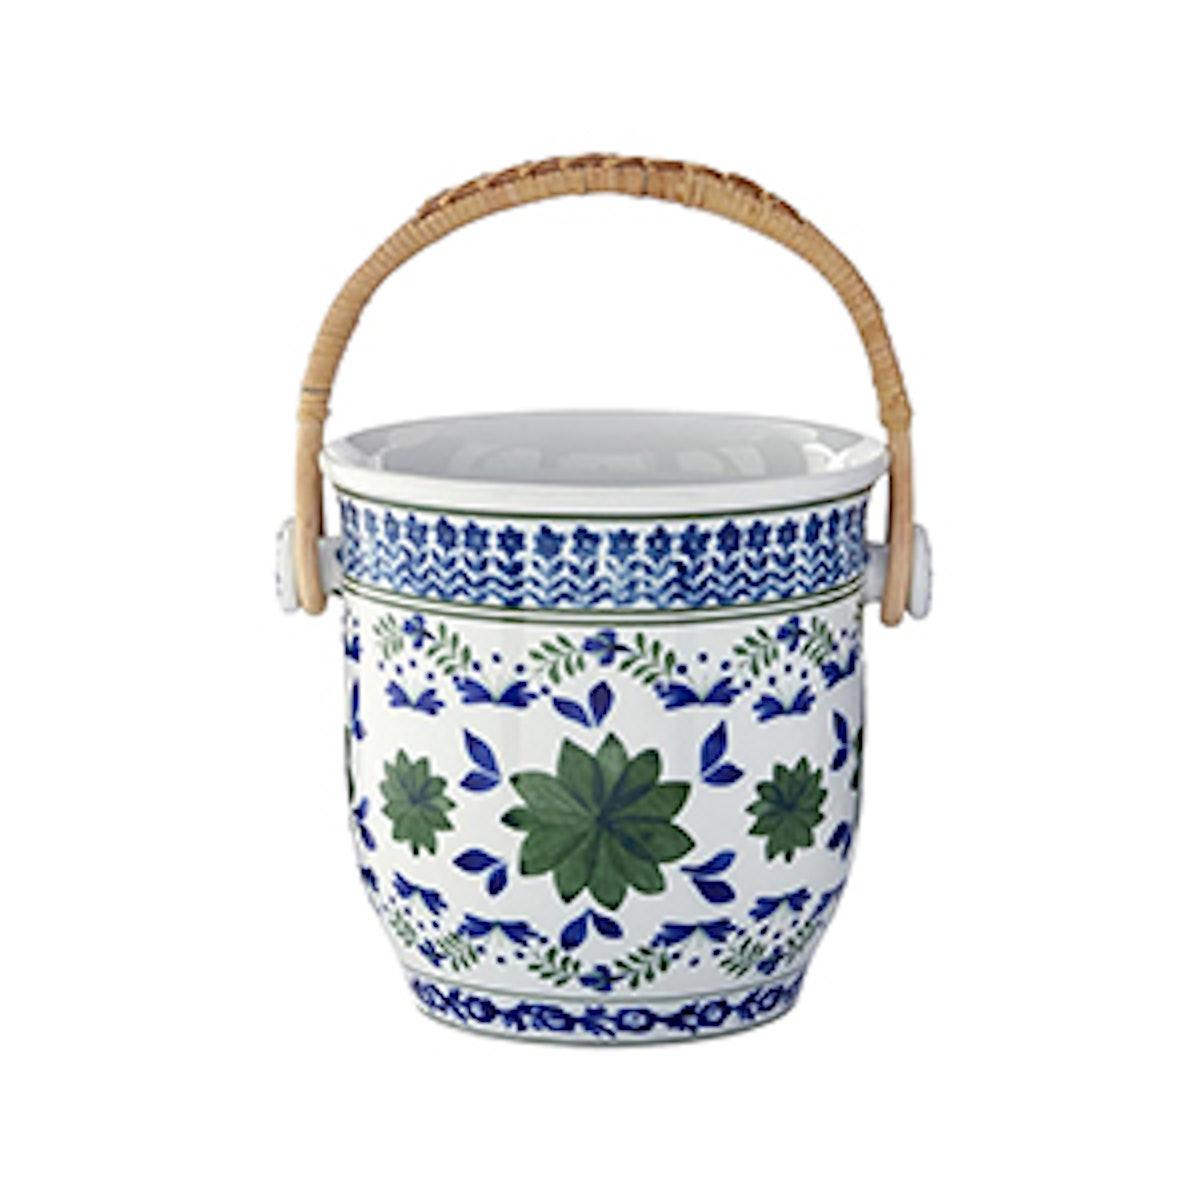 Ardsley Champagne Bucket With Woven Handle